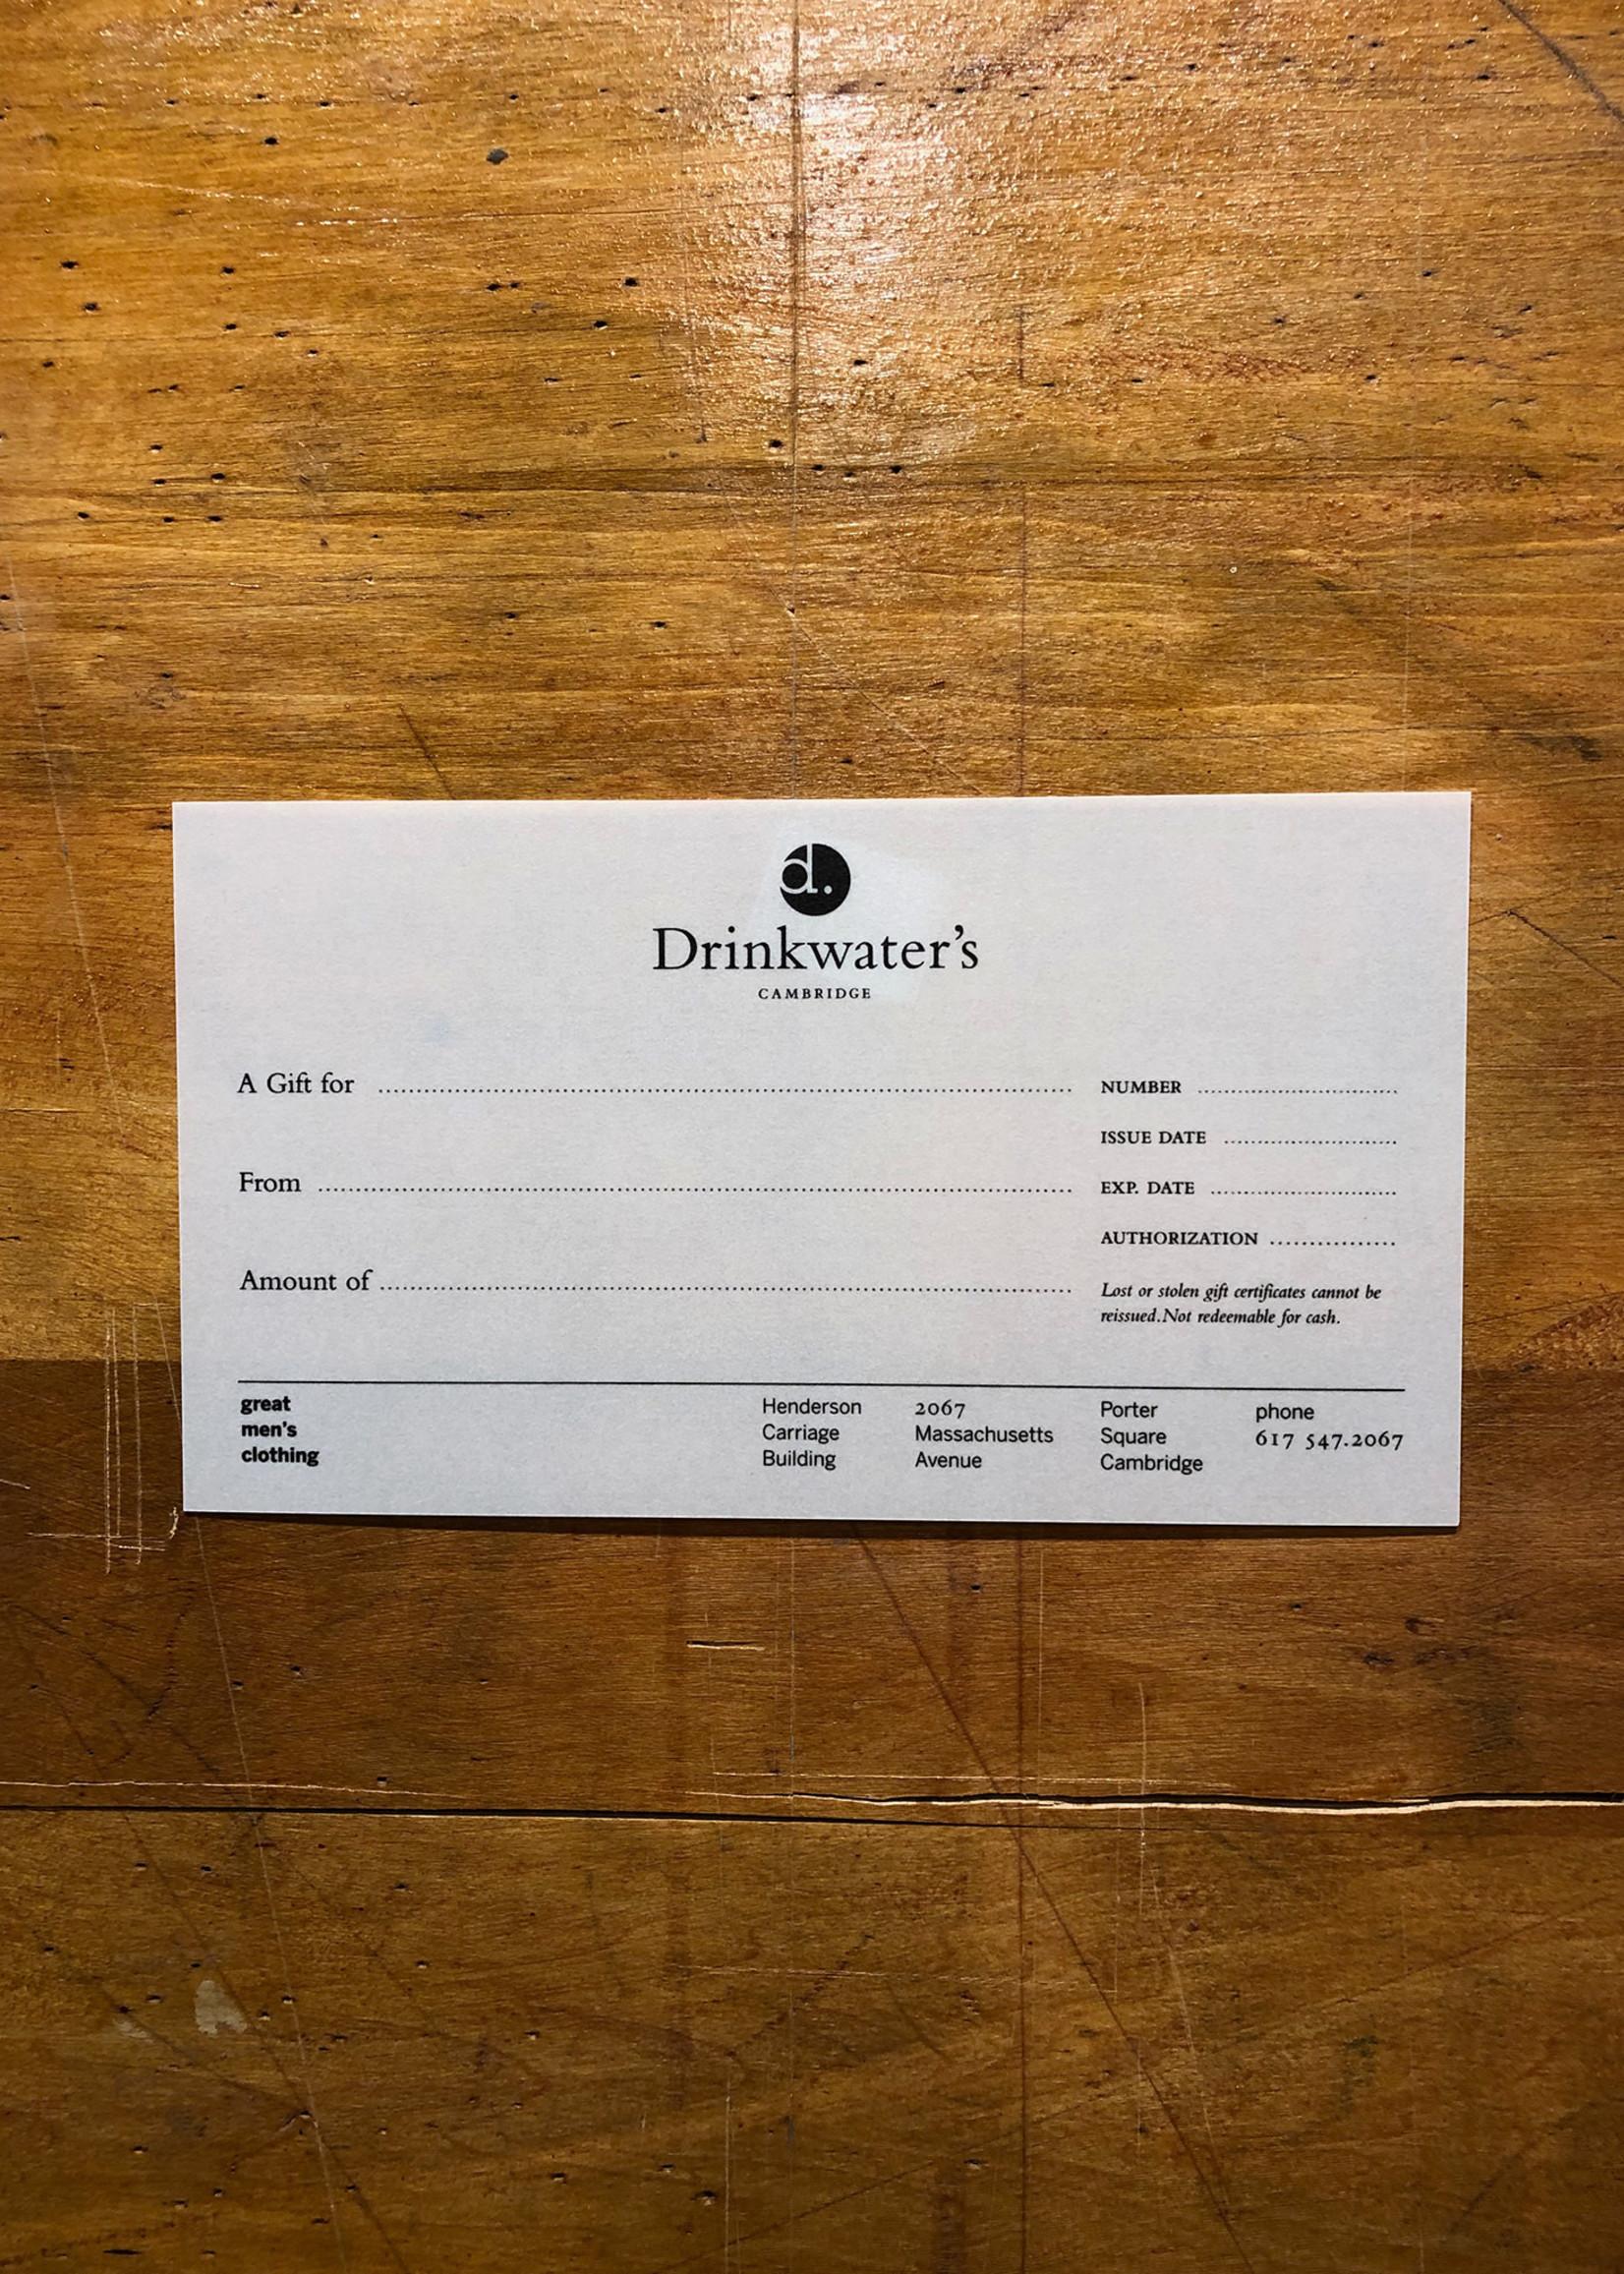 Drinkwater's Drinkwater's  Gift Certificate